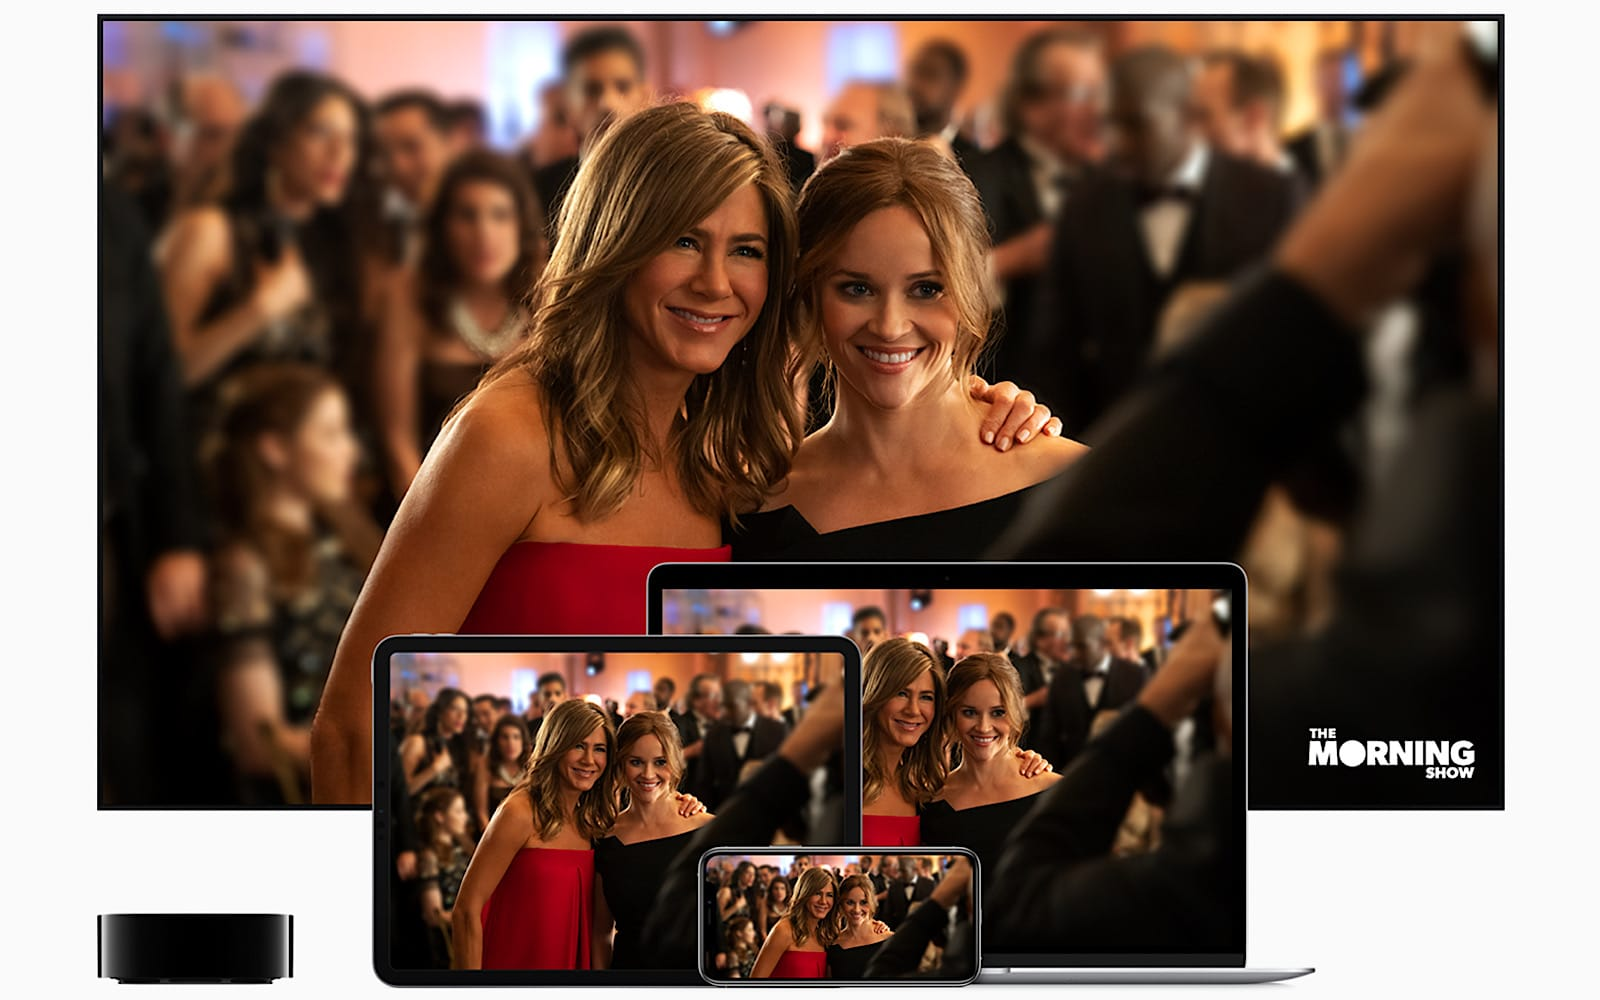 Apple's Apple TV+ streaming service